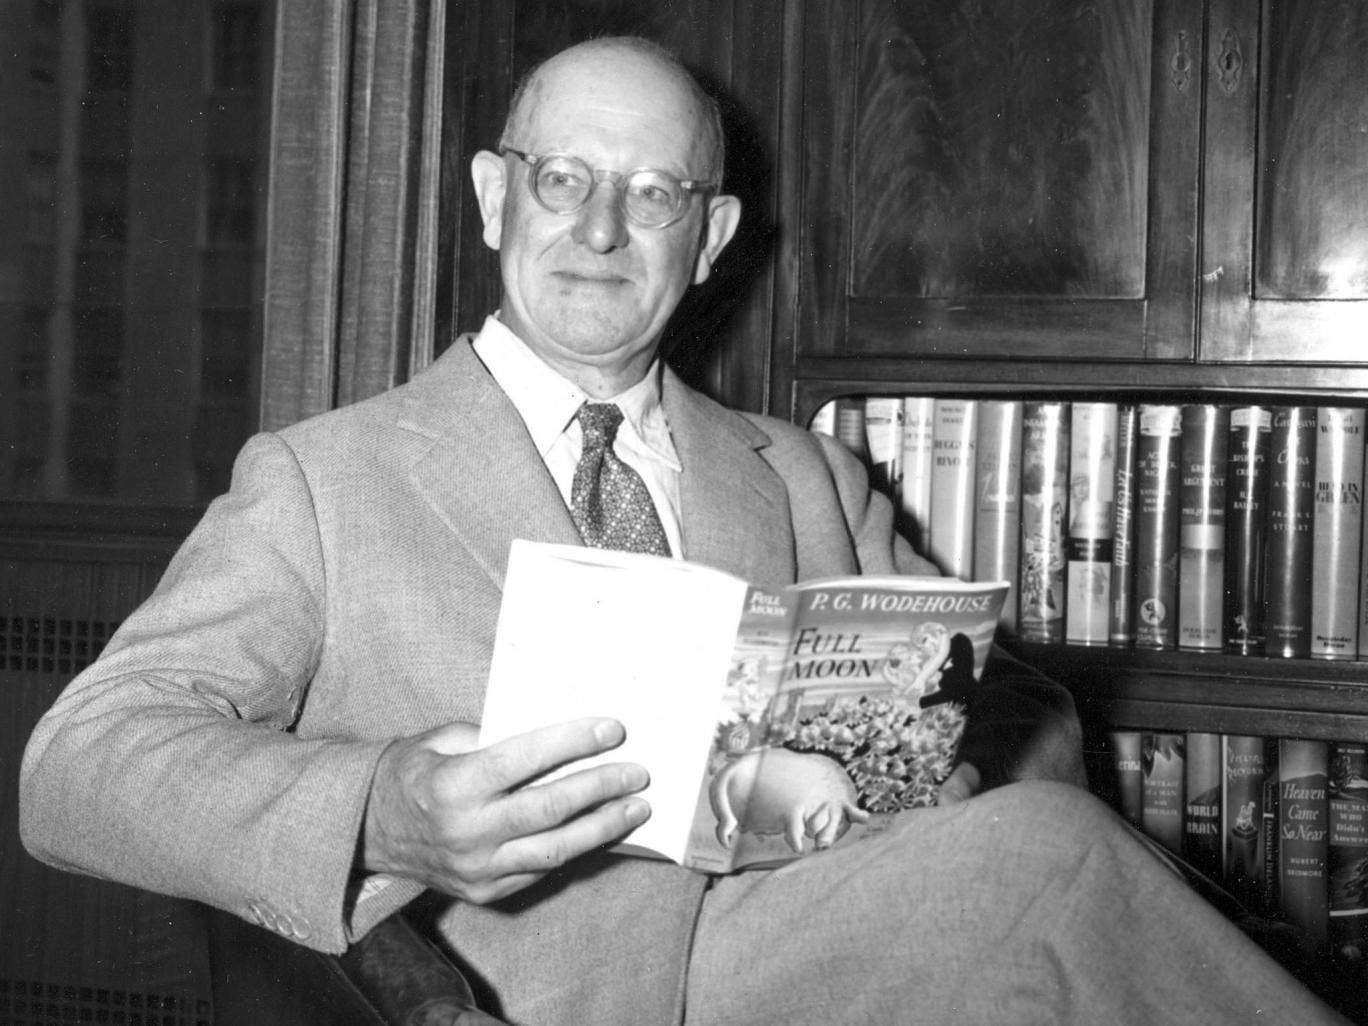 P G Wodehouse in 1947